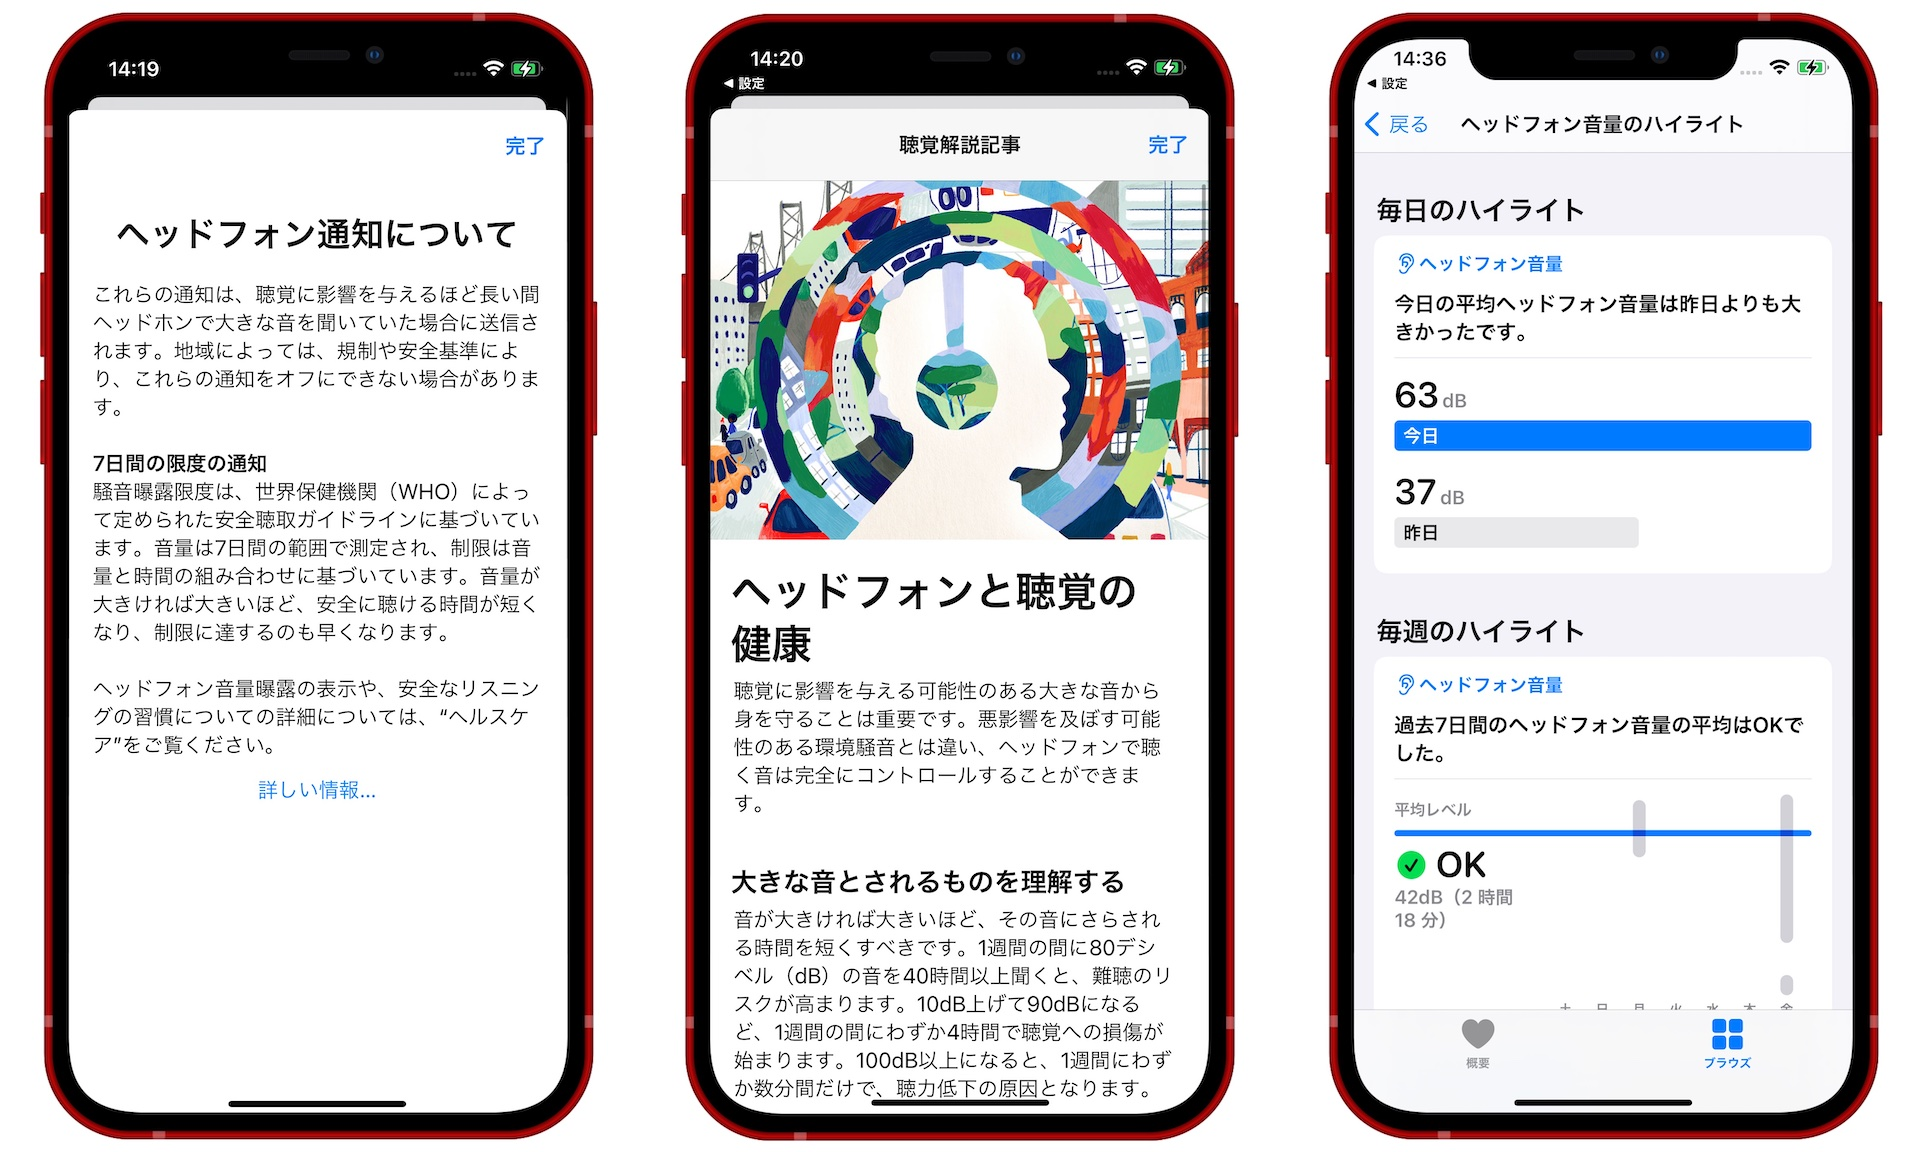 iOS 14.2のヘルスケアで騒音暴露限度を測定